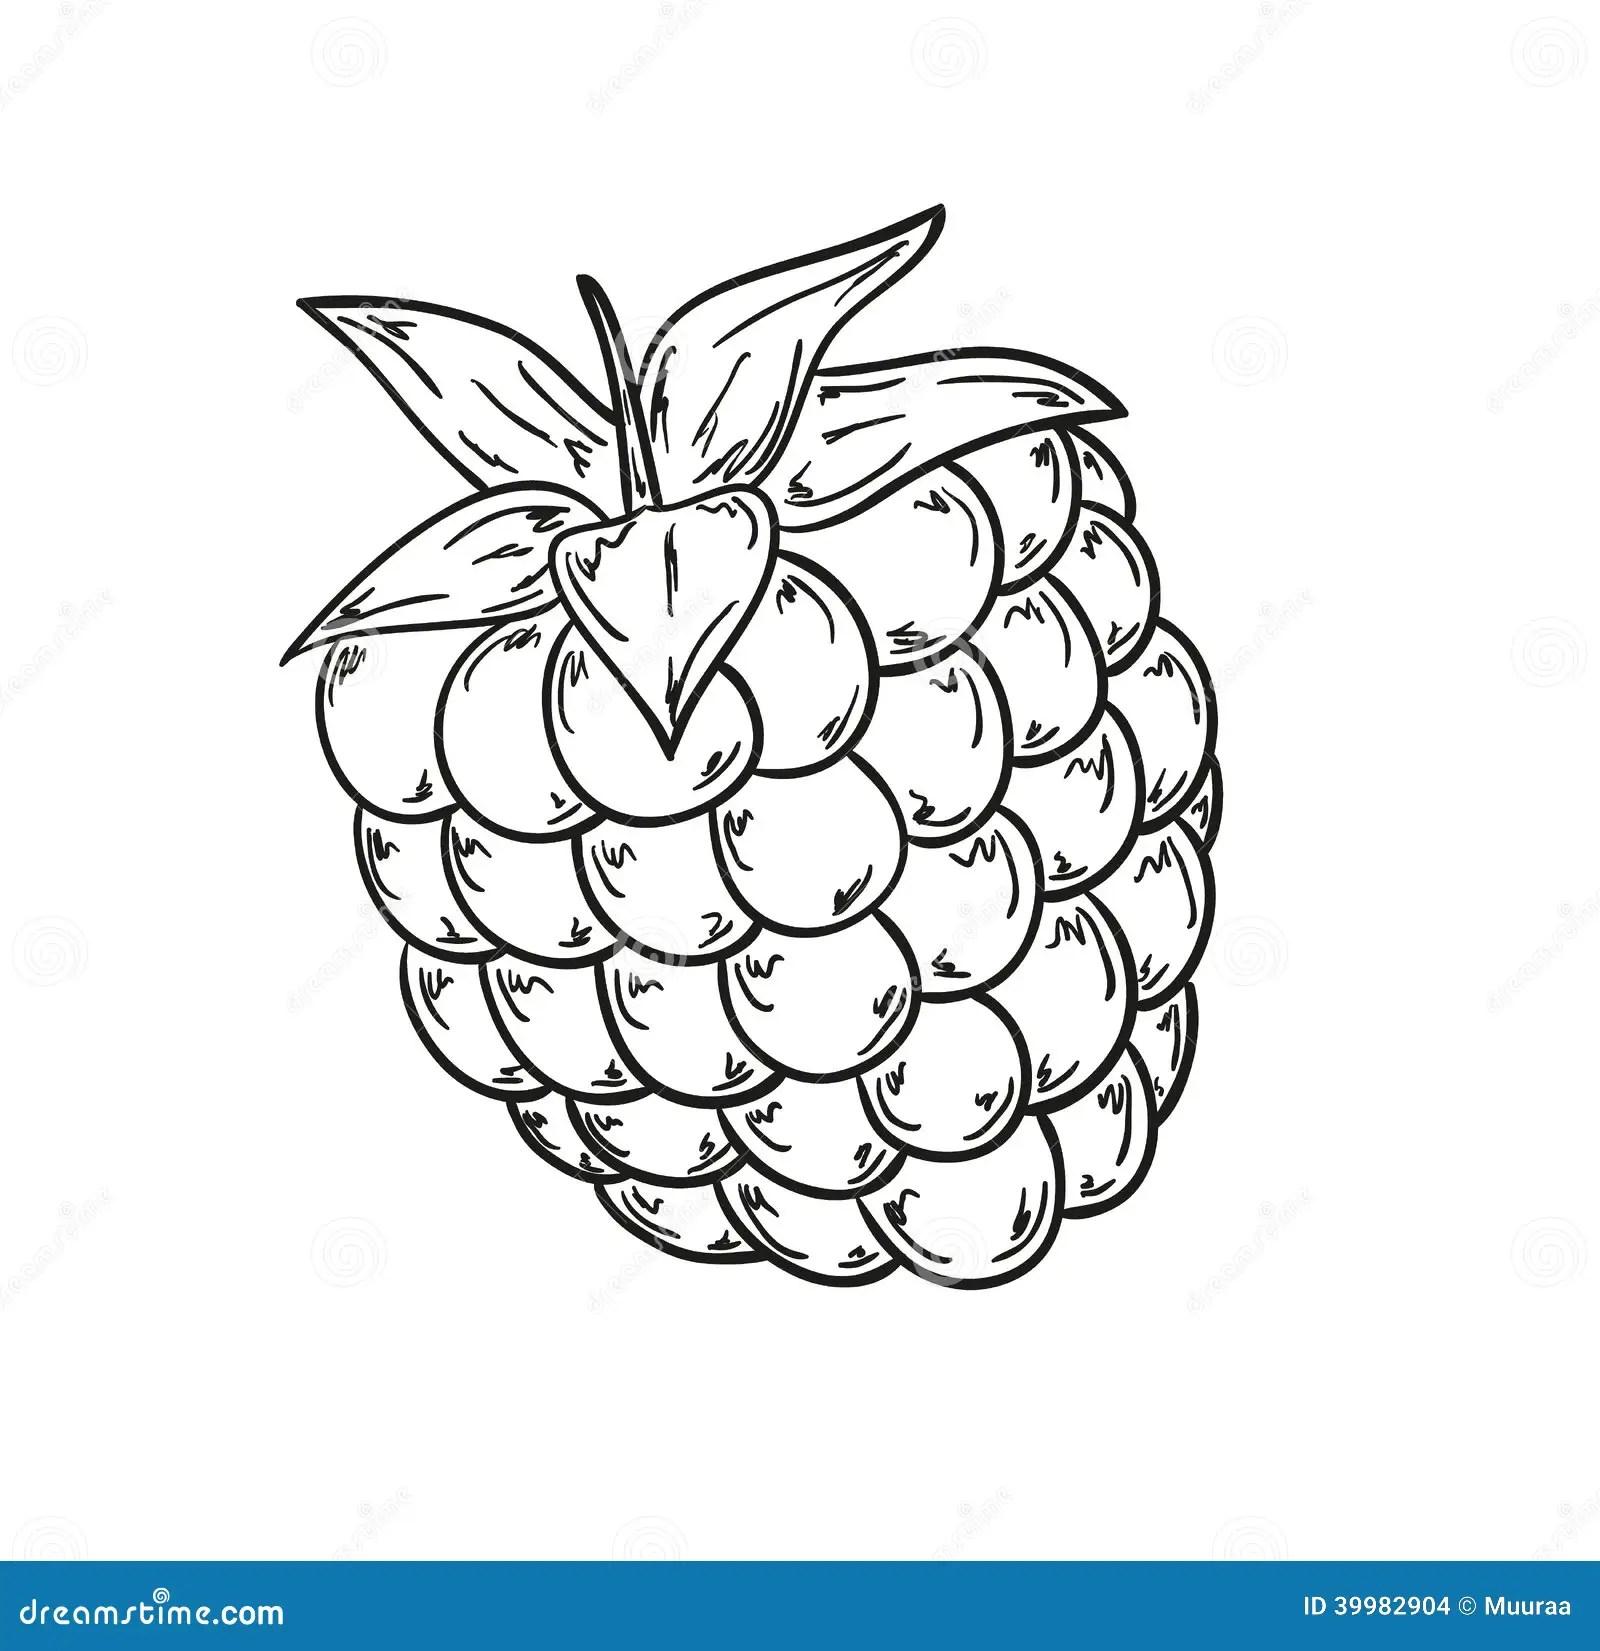 Raspberry Sketch Stock Illustration - Image 39982904